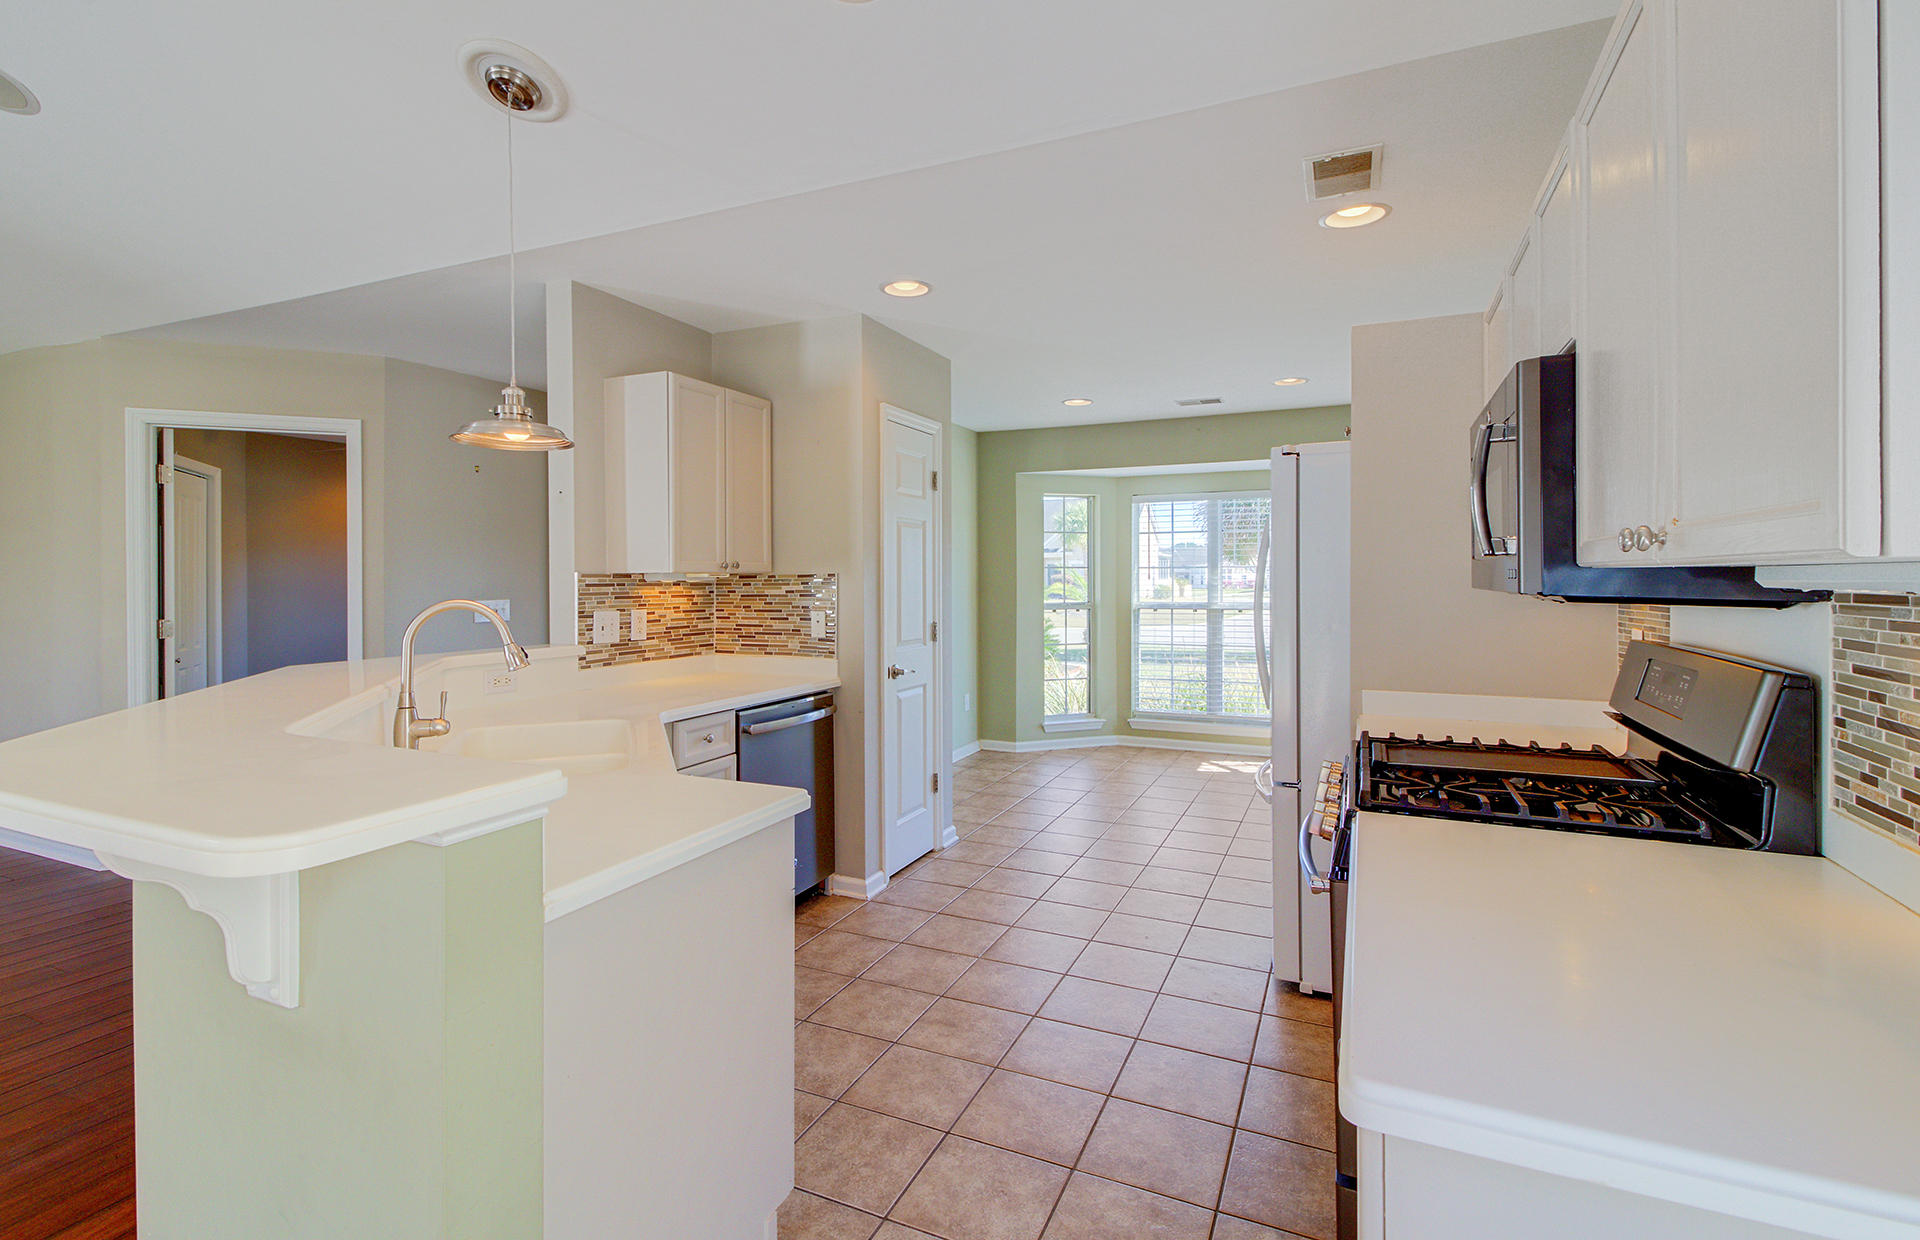 Grand Oaks Plantation Homes For Sale - 789 Bent Hickory, Charleston, SC - 10